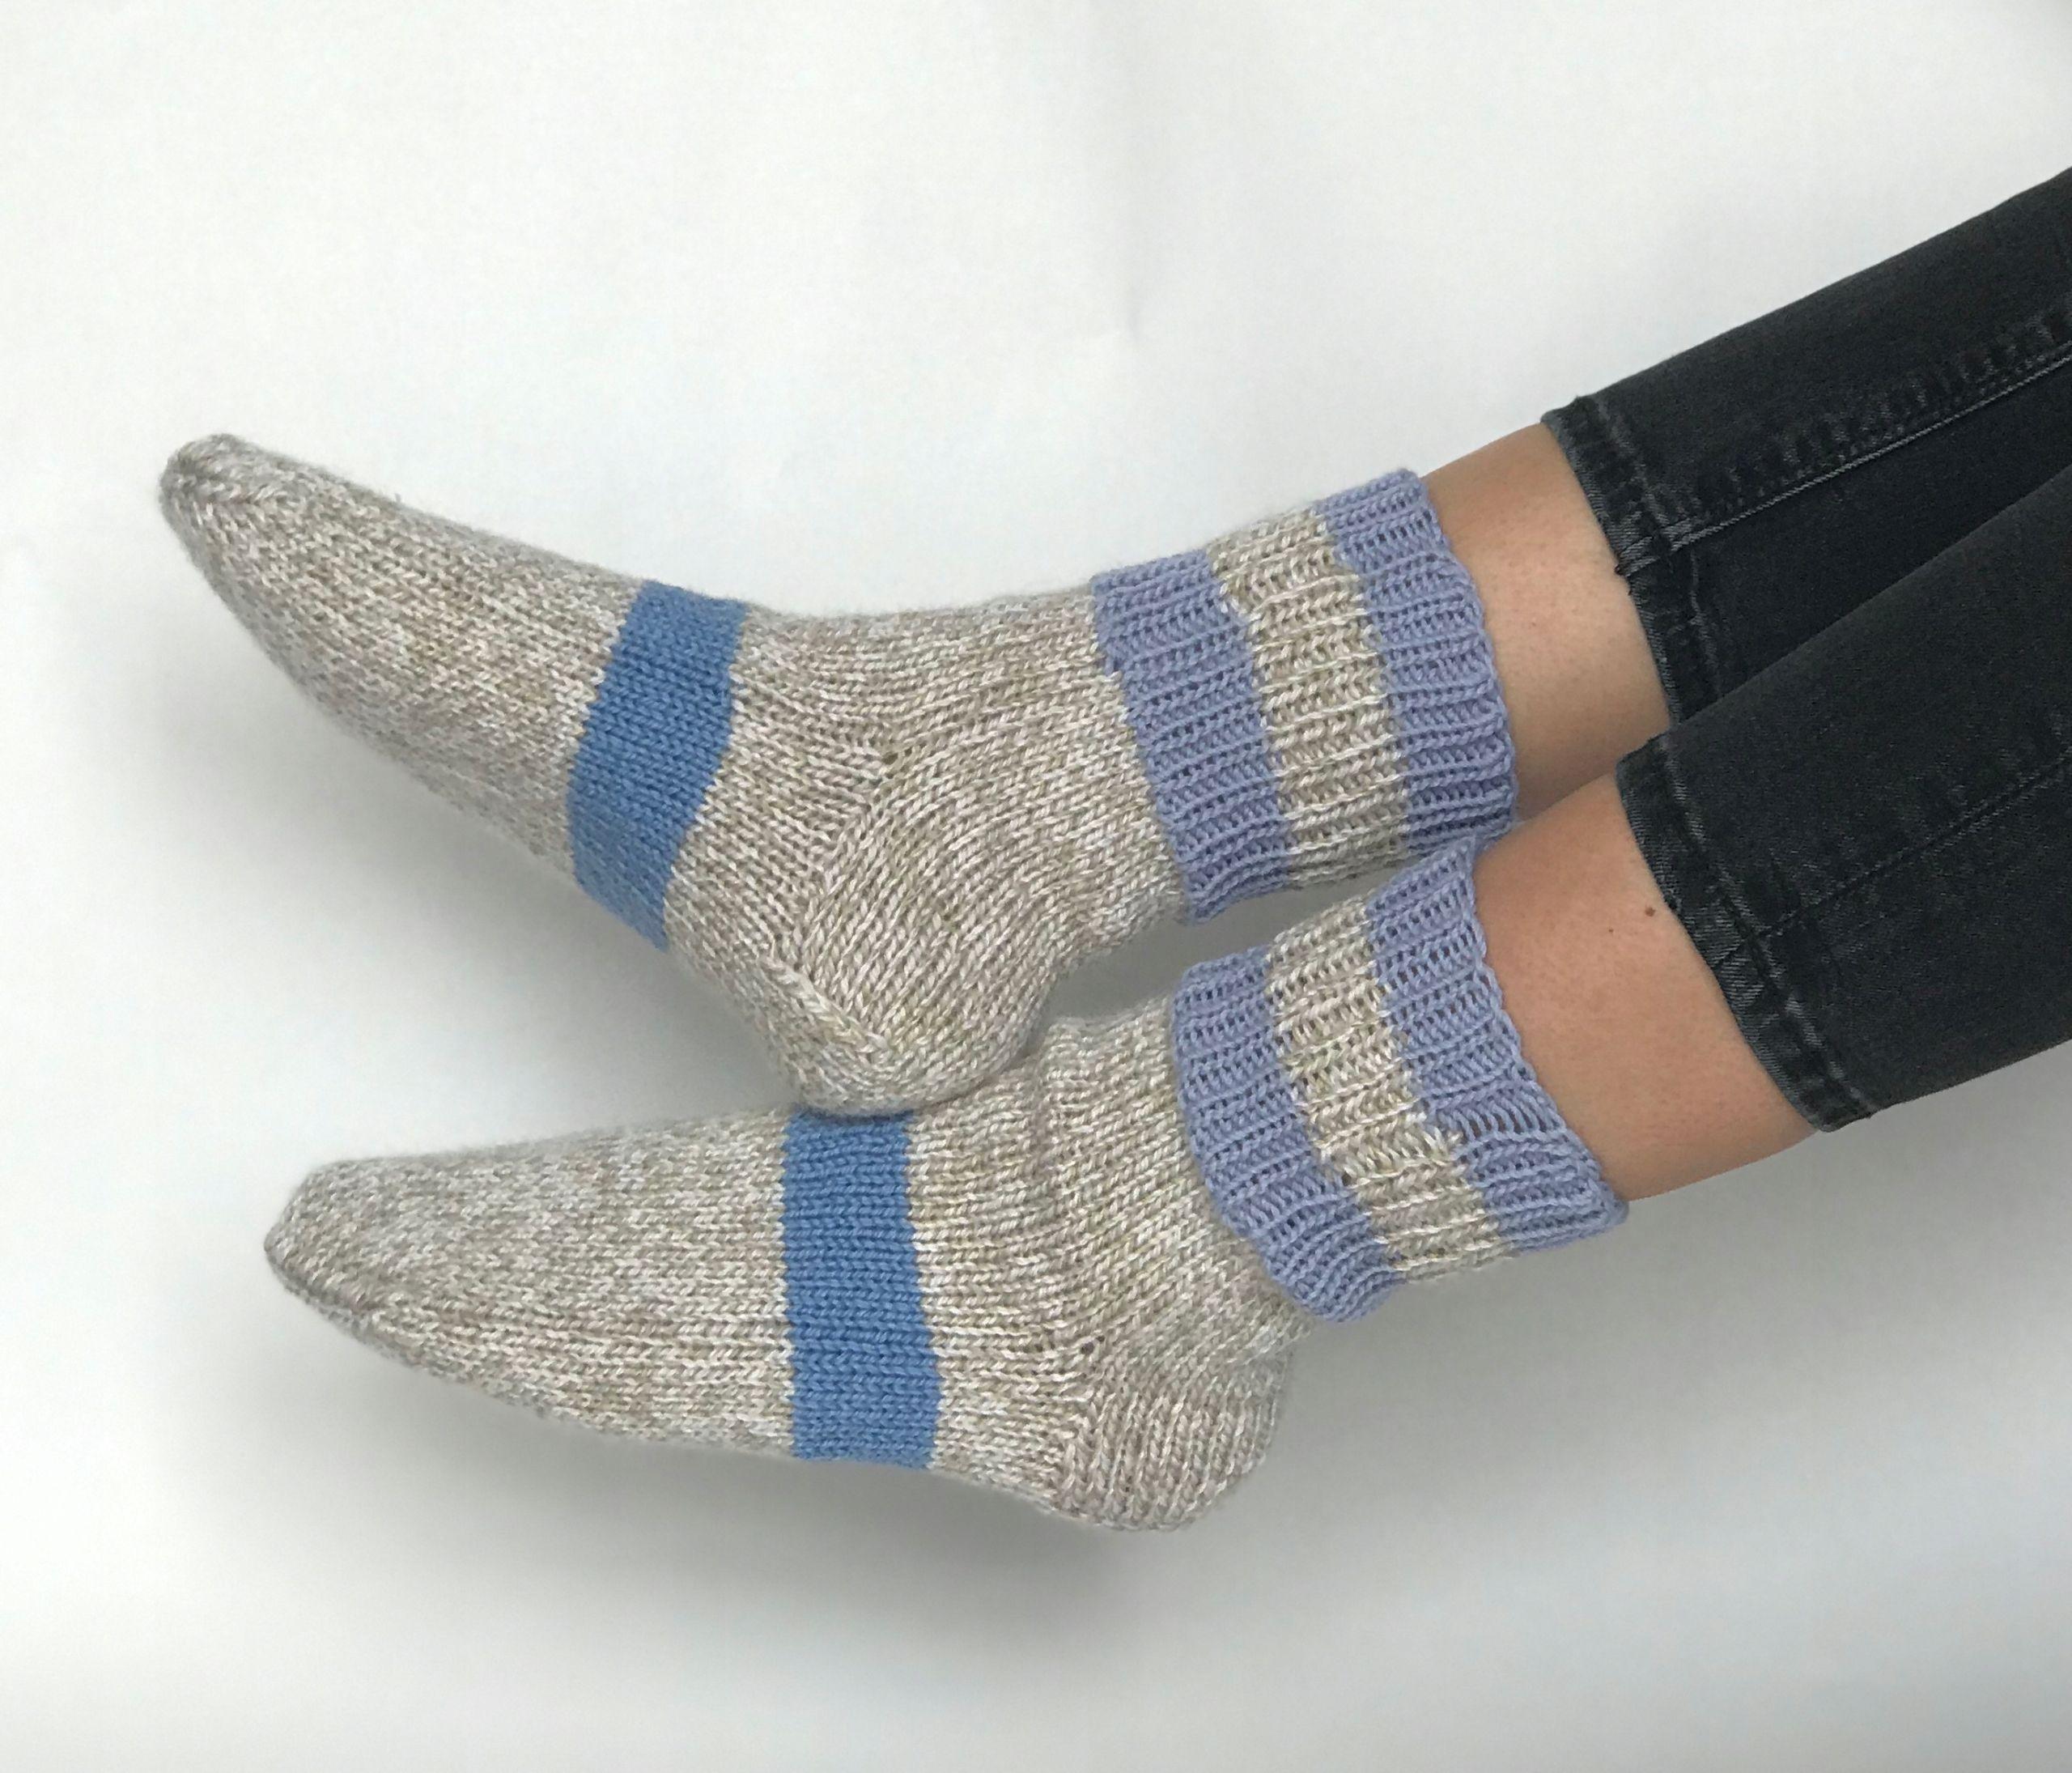 Skarpety Robione Na Drutach Welniane Rekodzielo 8909972336 Oficjalne Archiwum Allegro Knit Leg Warmers Wool Socks Mens Hand Knit Socks